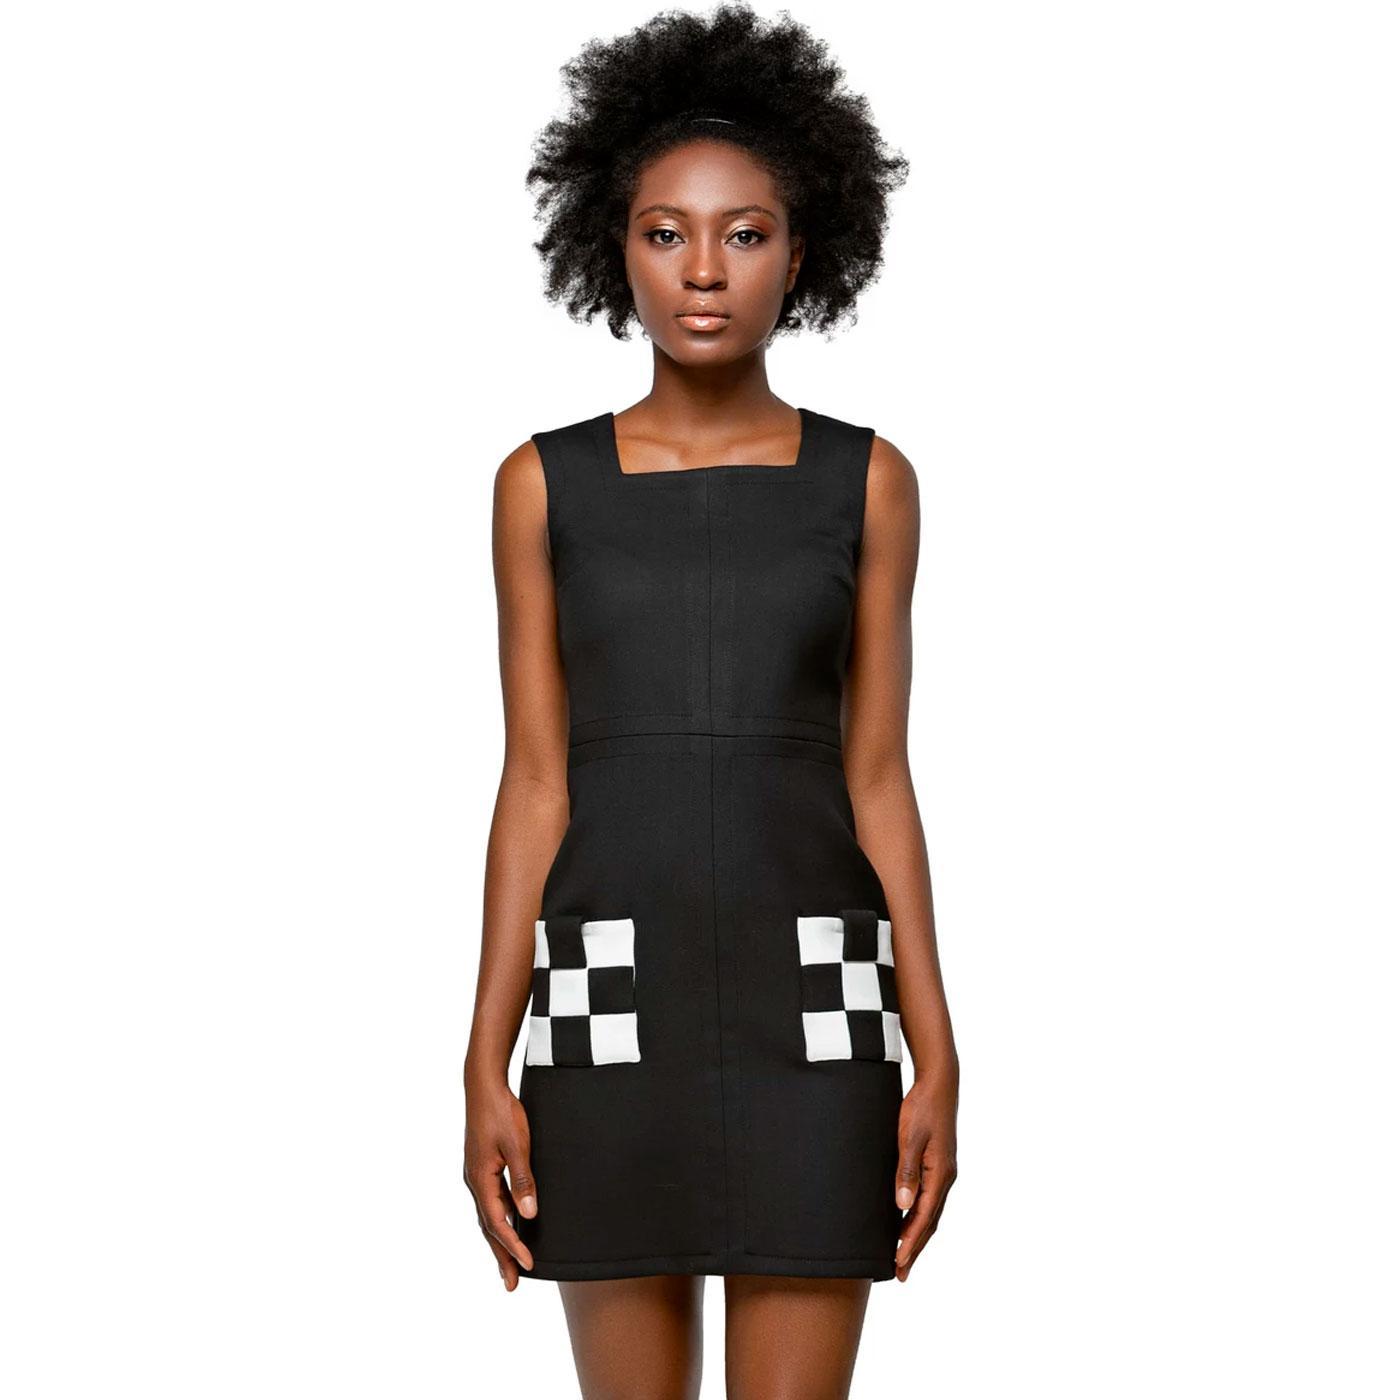 MARMALADE Square Neckline Ska Checkerboard Dress